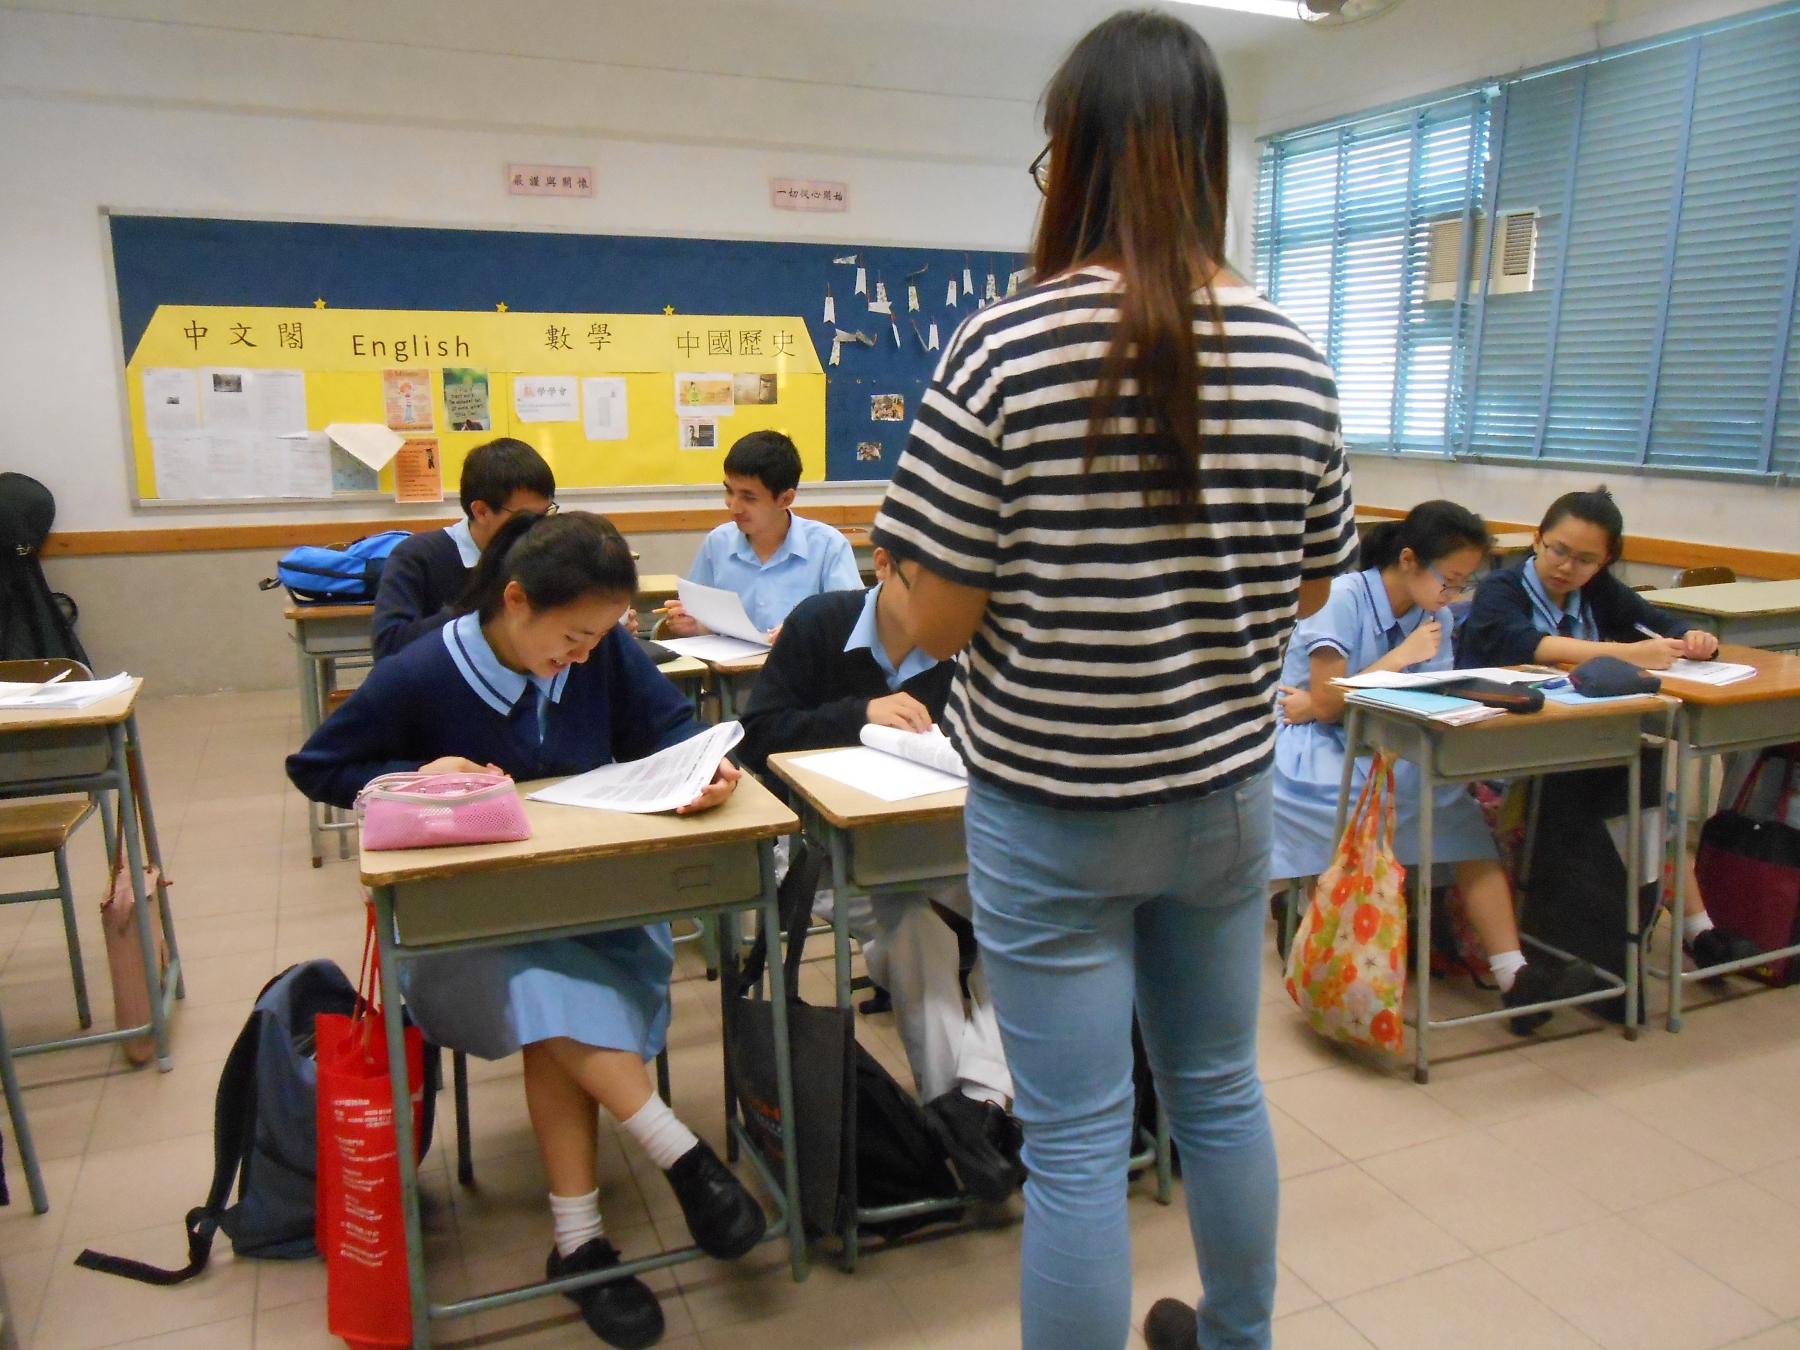 http://npc.edu.hk/sites/default/files/dscn8896_1.jpg